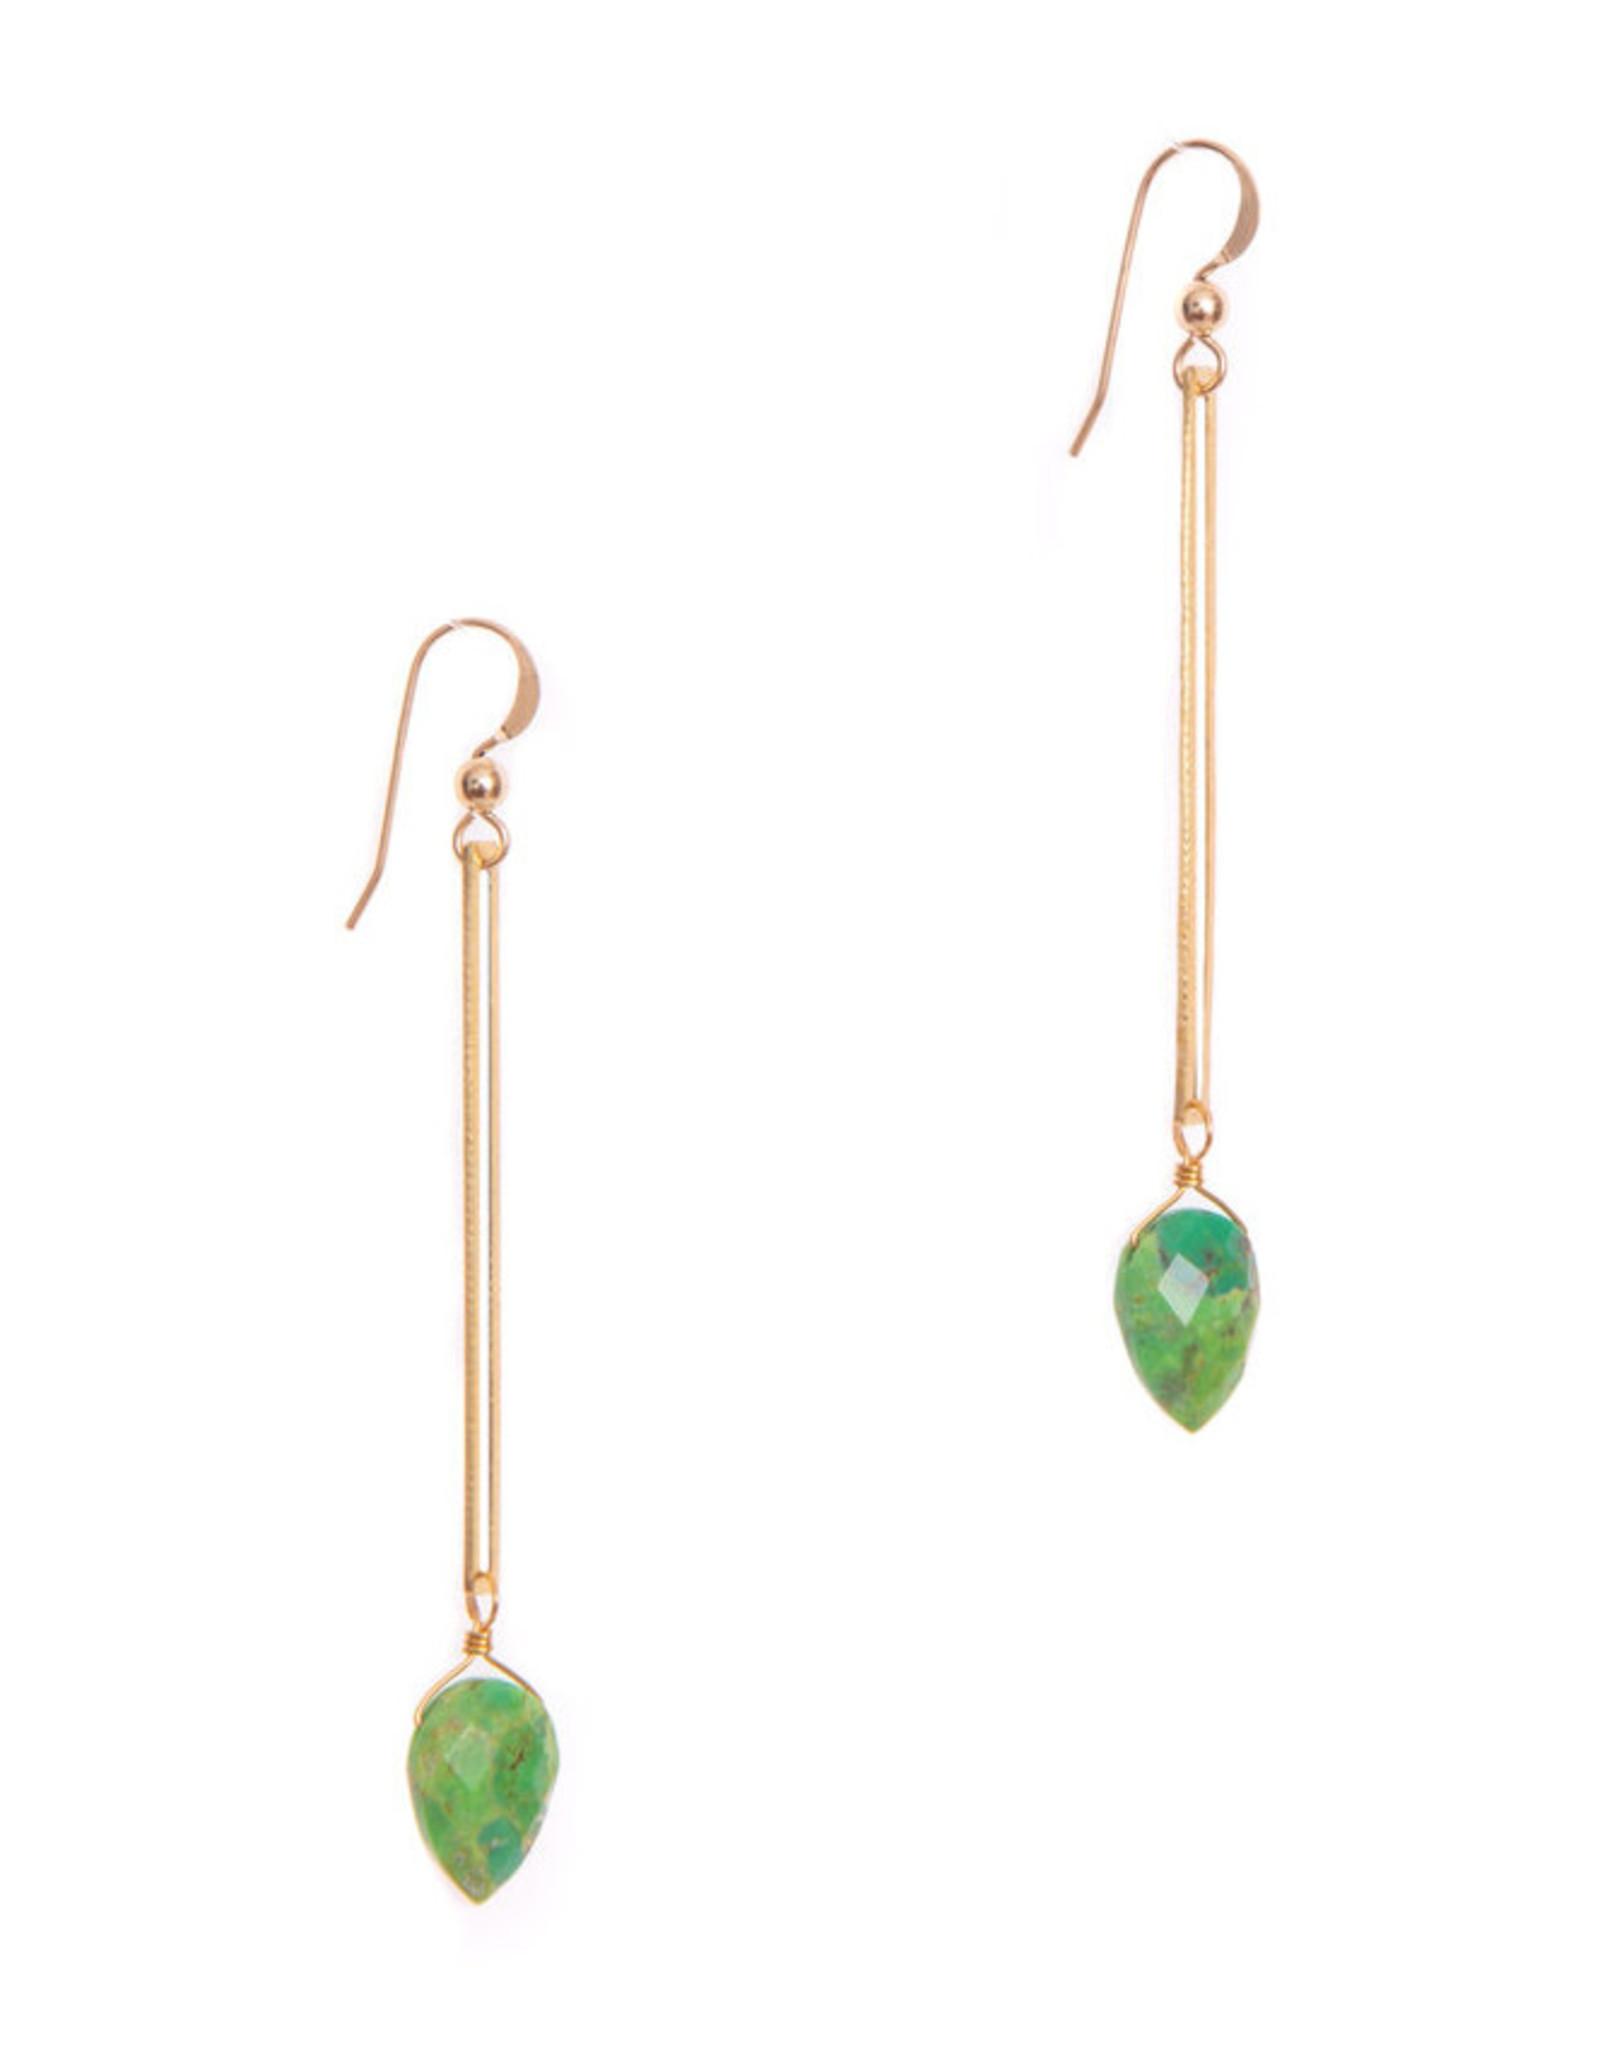 Hailey Gerrits Designs Isla Earrings - Green Turquoise